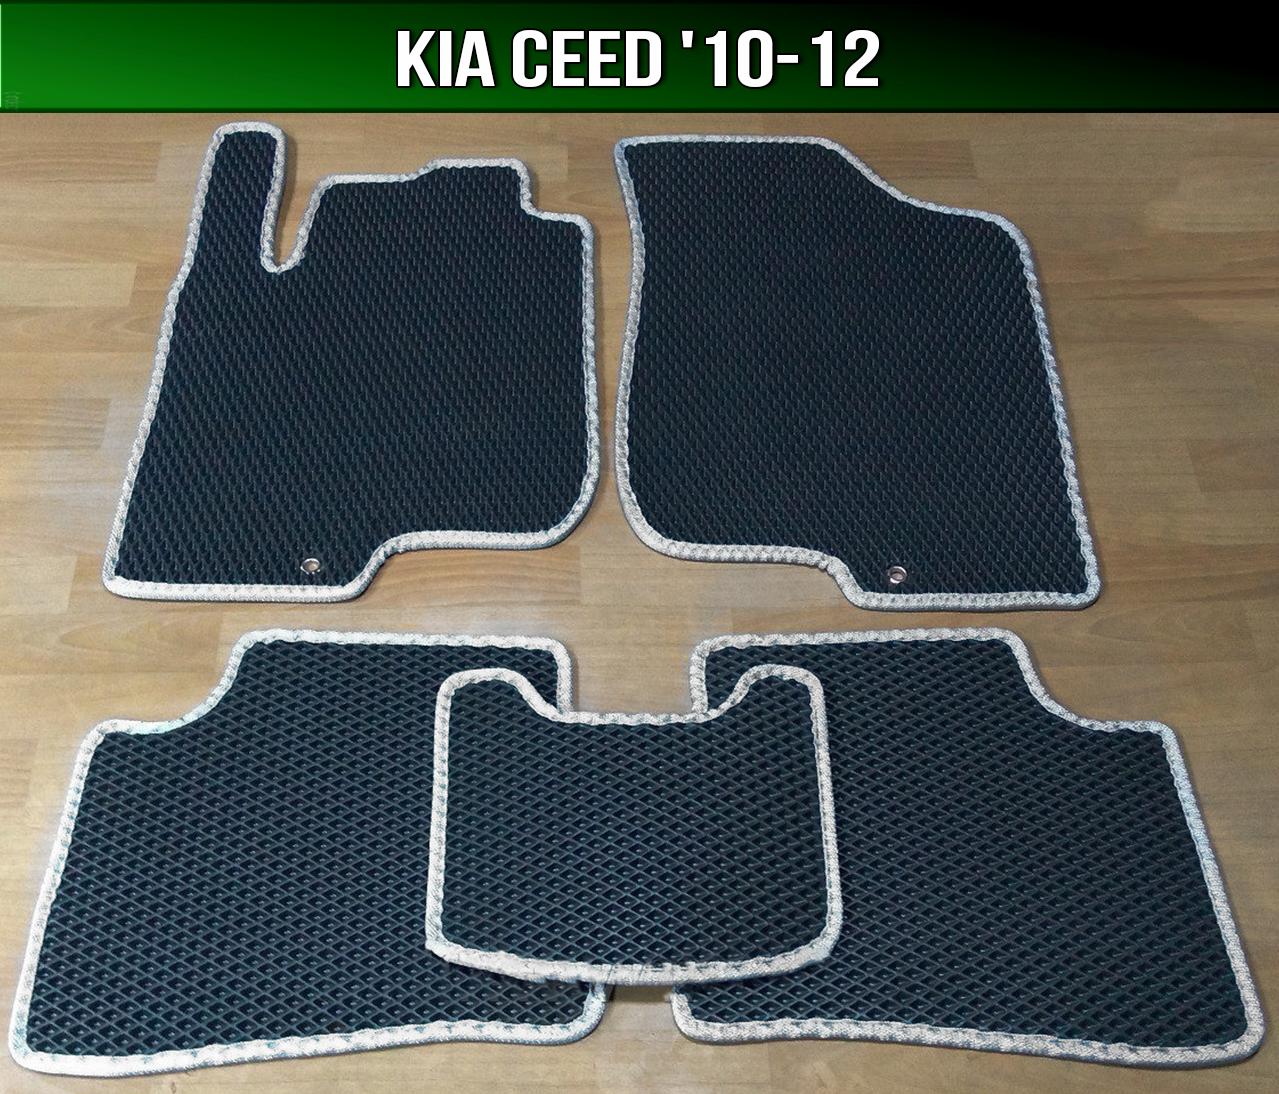 ЕВА коврики на KIA Ceed '10-12. Ковры EVA КИА Сид